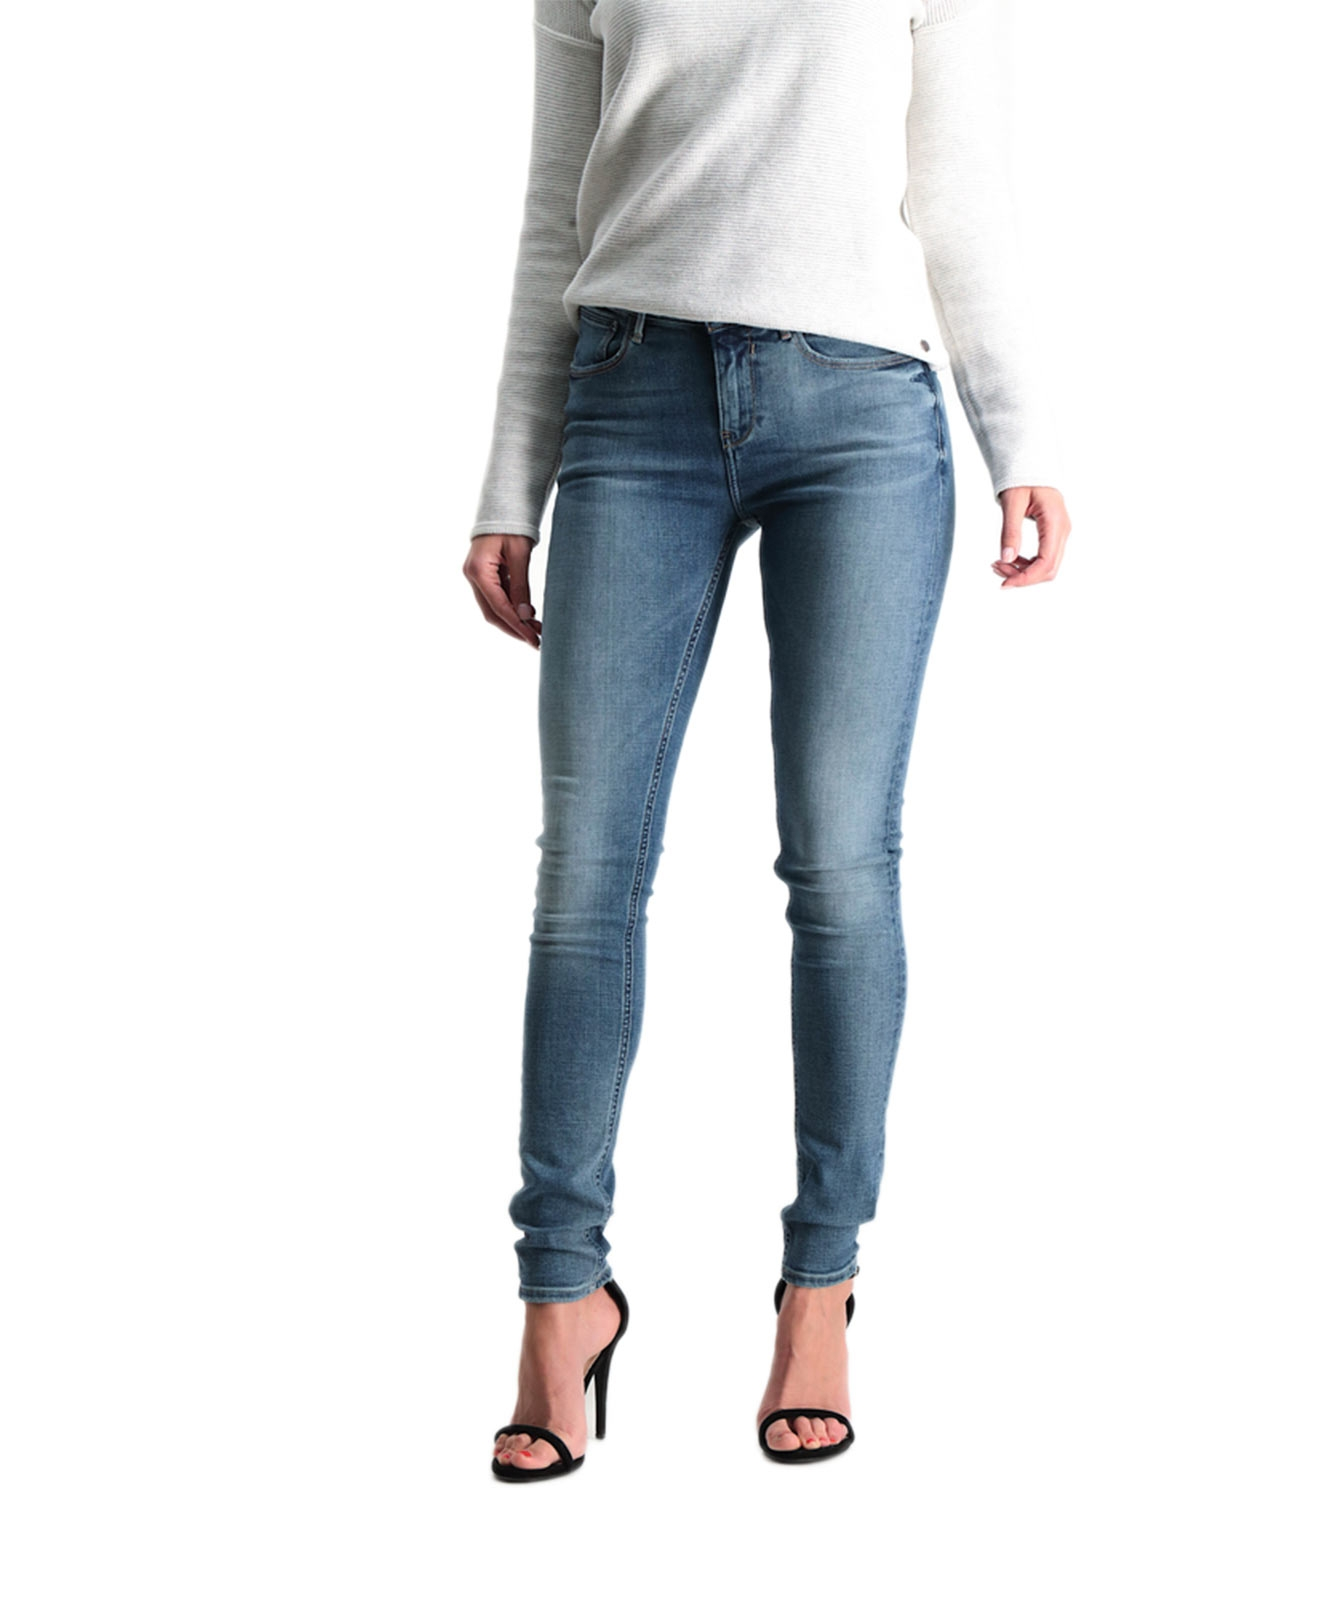 Hosen - Garcia Slim Fit Jeans Celia in Retro Power  - Onlineshop Jeans Meile